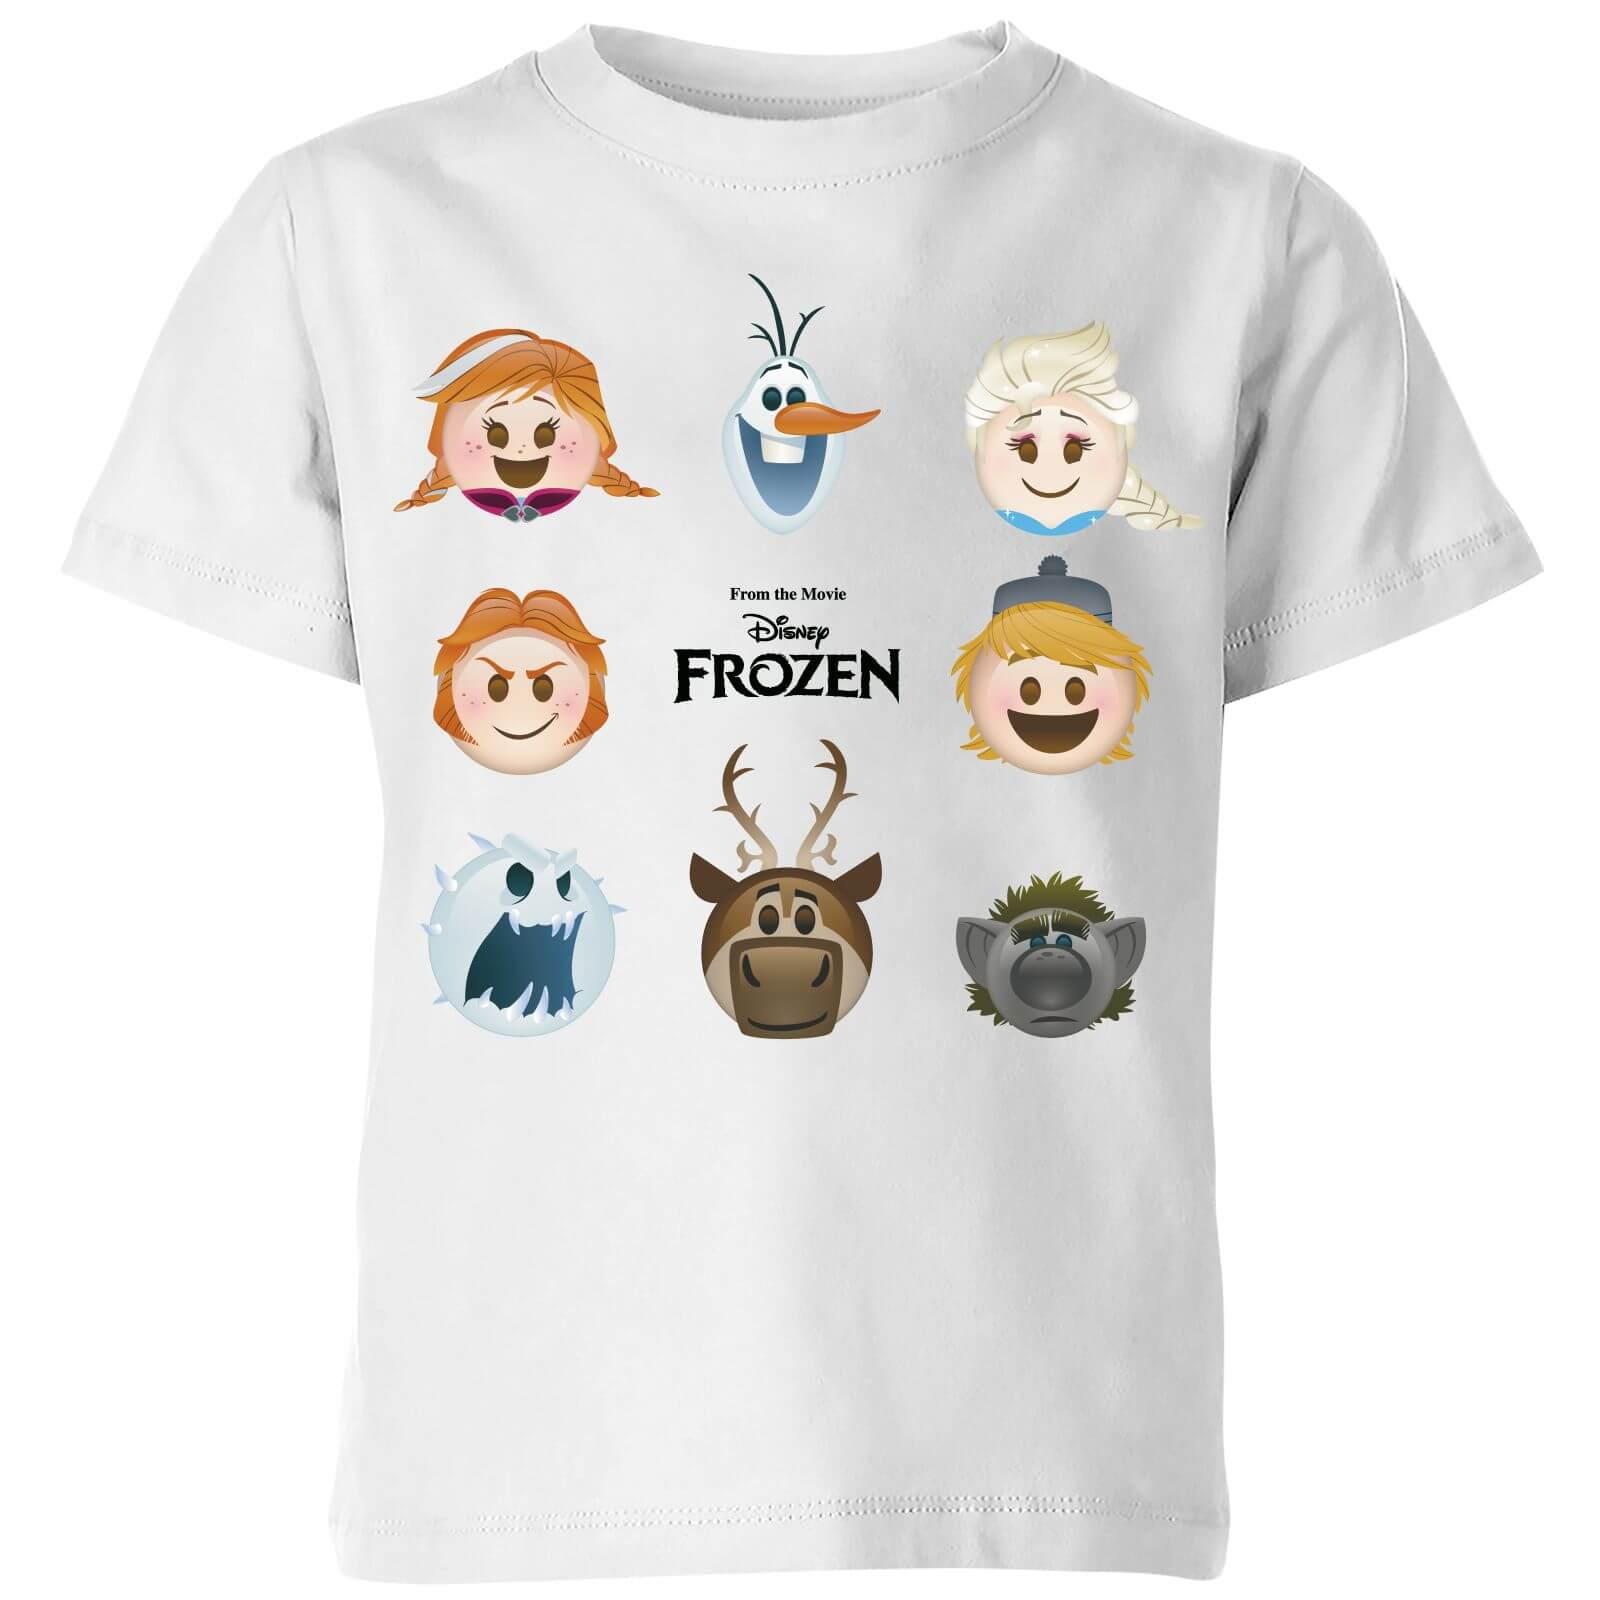 4badc69e4 Camiseta Disney Frozen Personajes Emoji - Niño - Blanco Clothing ...